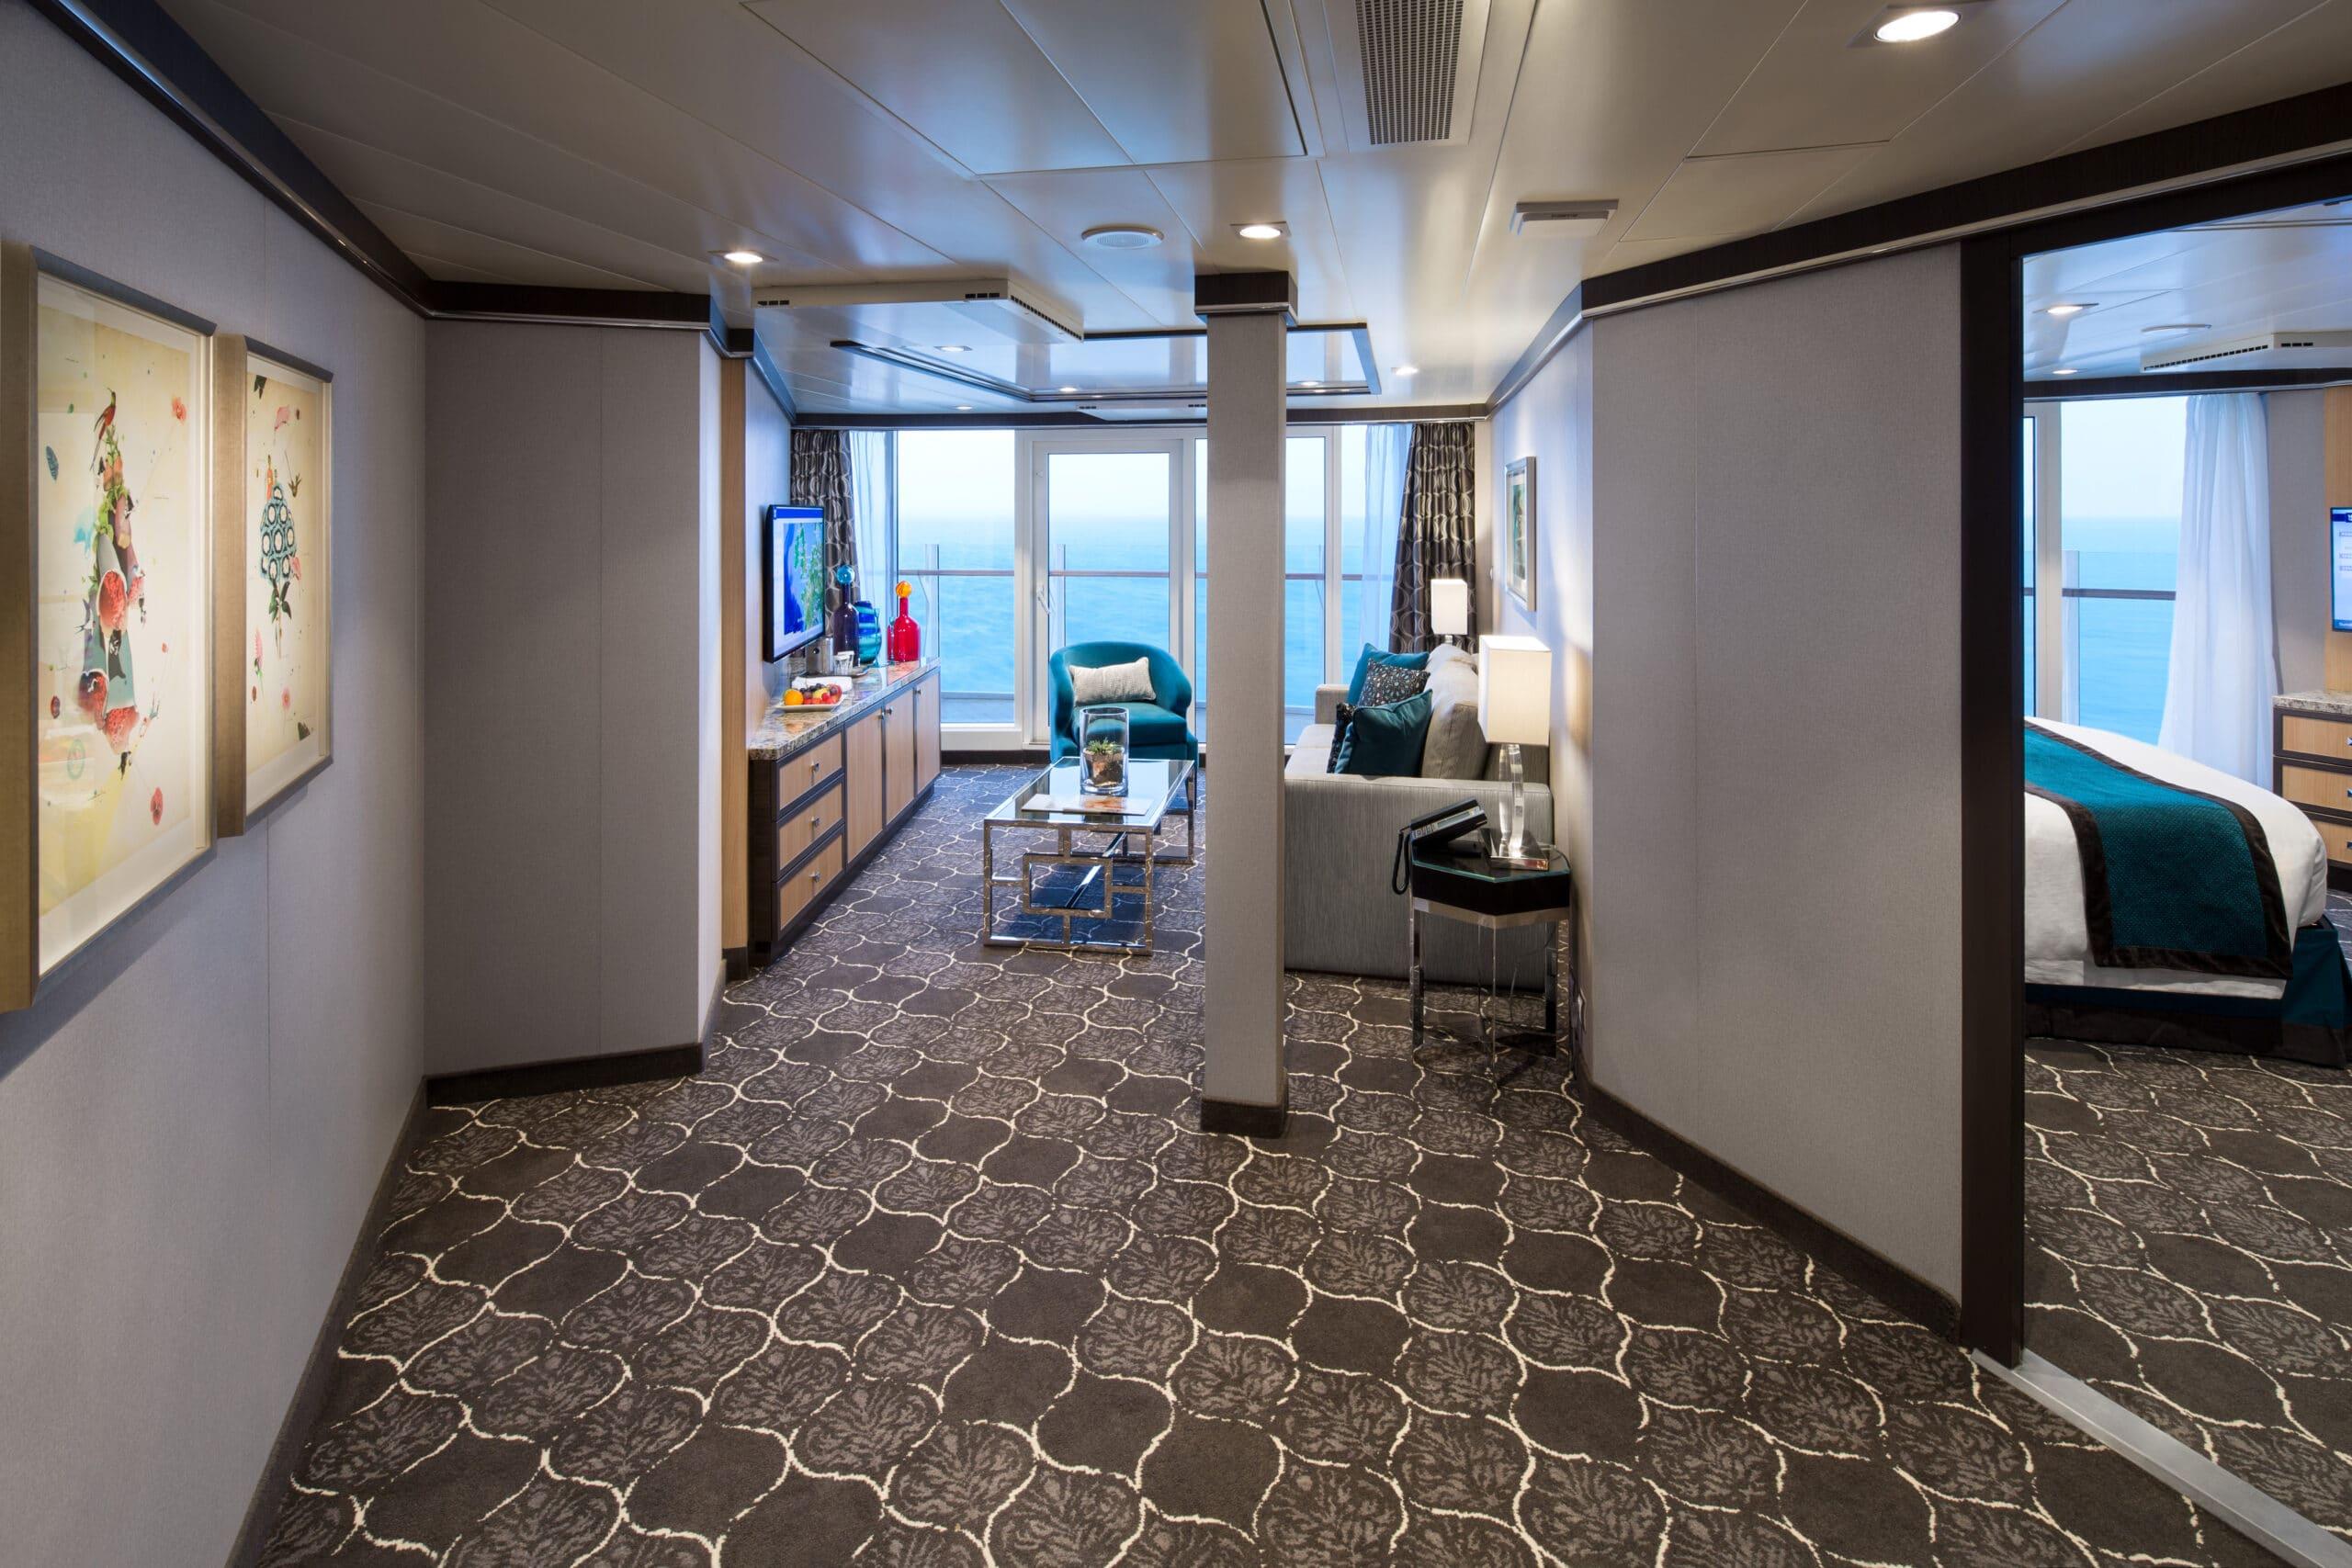 Royal-Caribbean-International-Harmony-of-the-Seas-Symphony-of-the-seas-schip-cruiseschip-categorie-A3-Ruime-Aqua-theater-suite